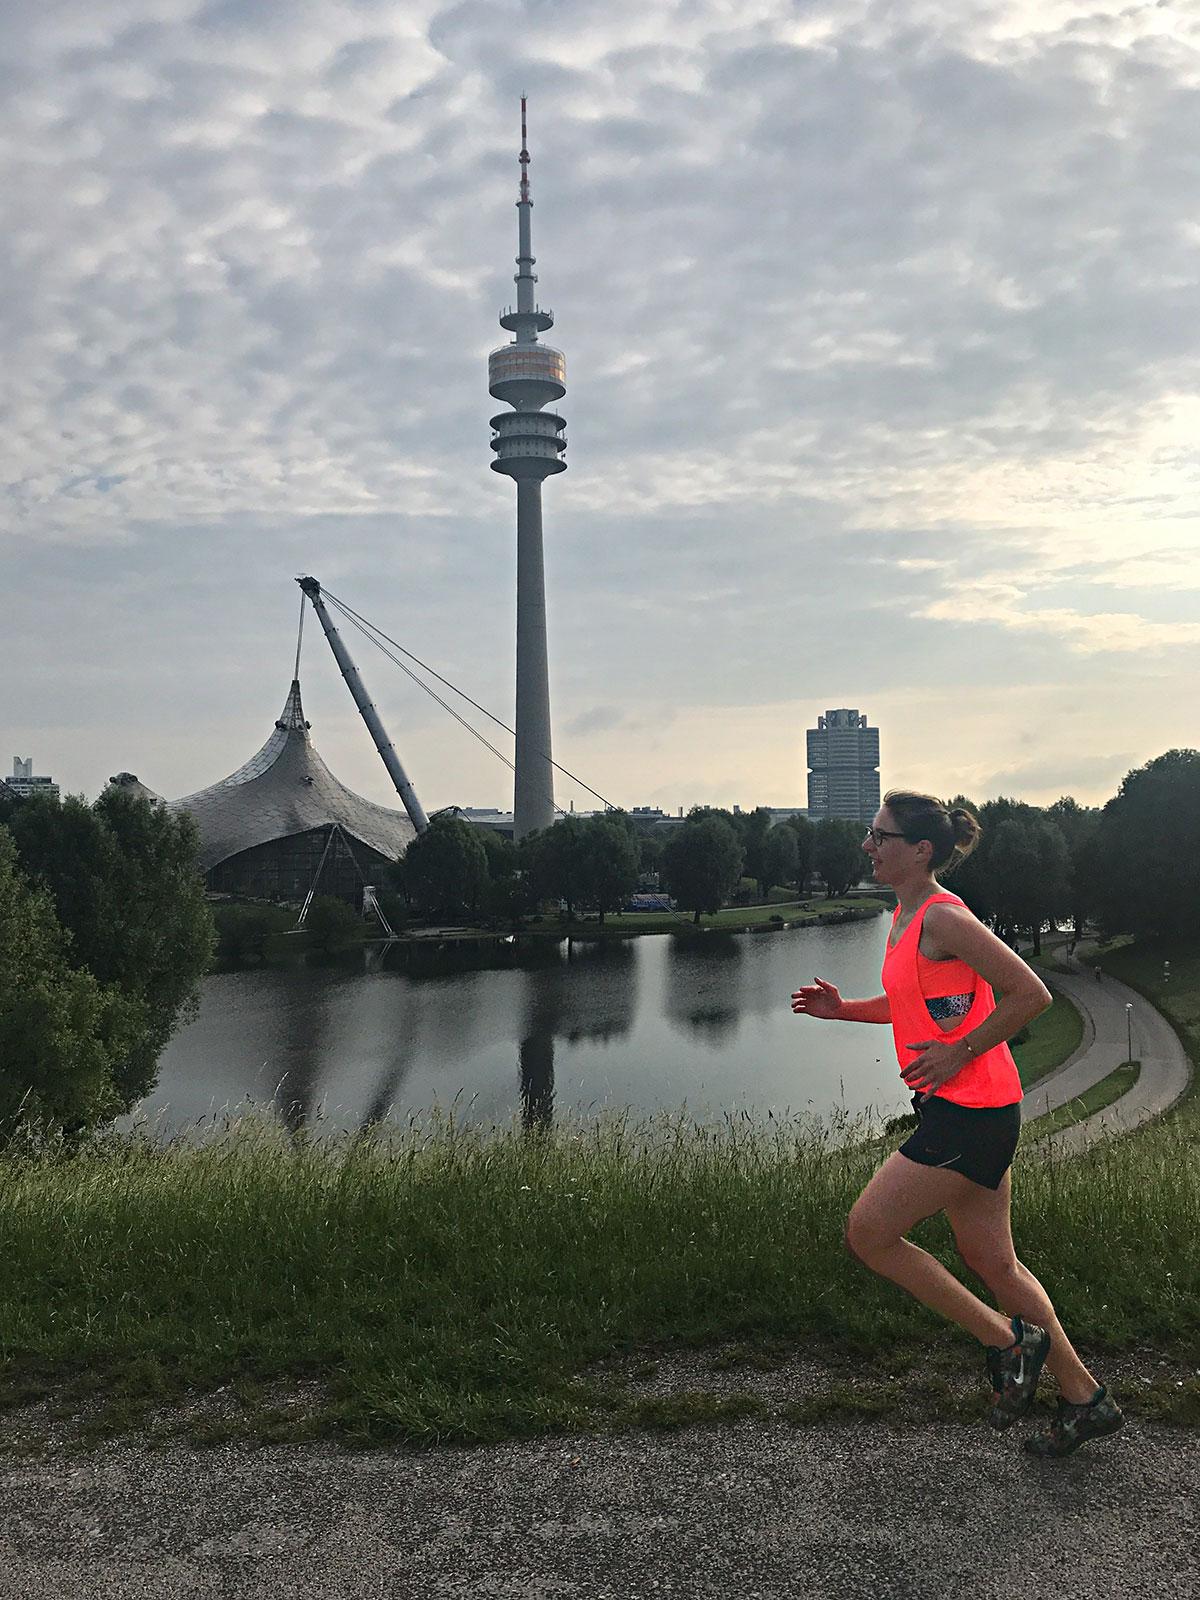 Joana_Schmidtjansen_Rumpeldipumpel_Laufen_Olympiapark